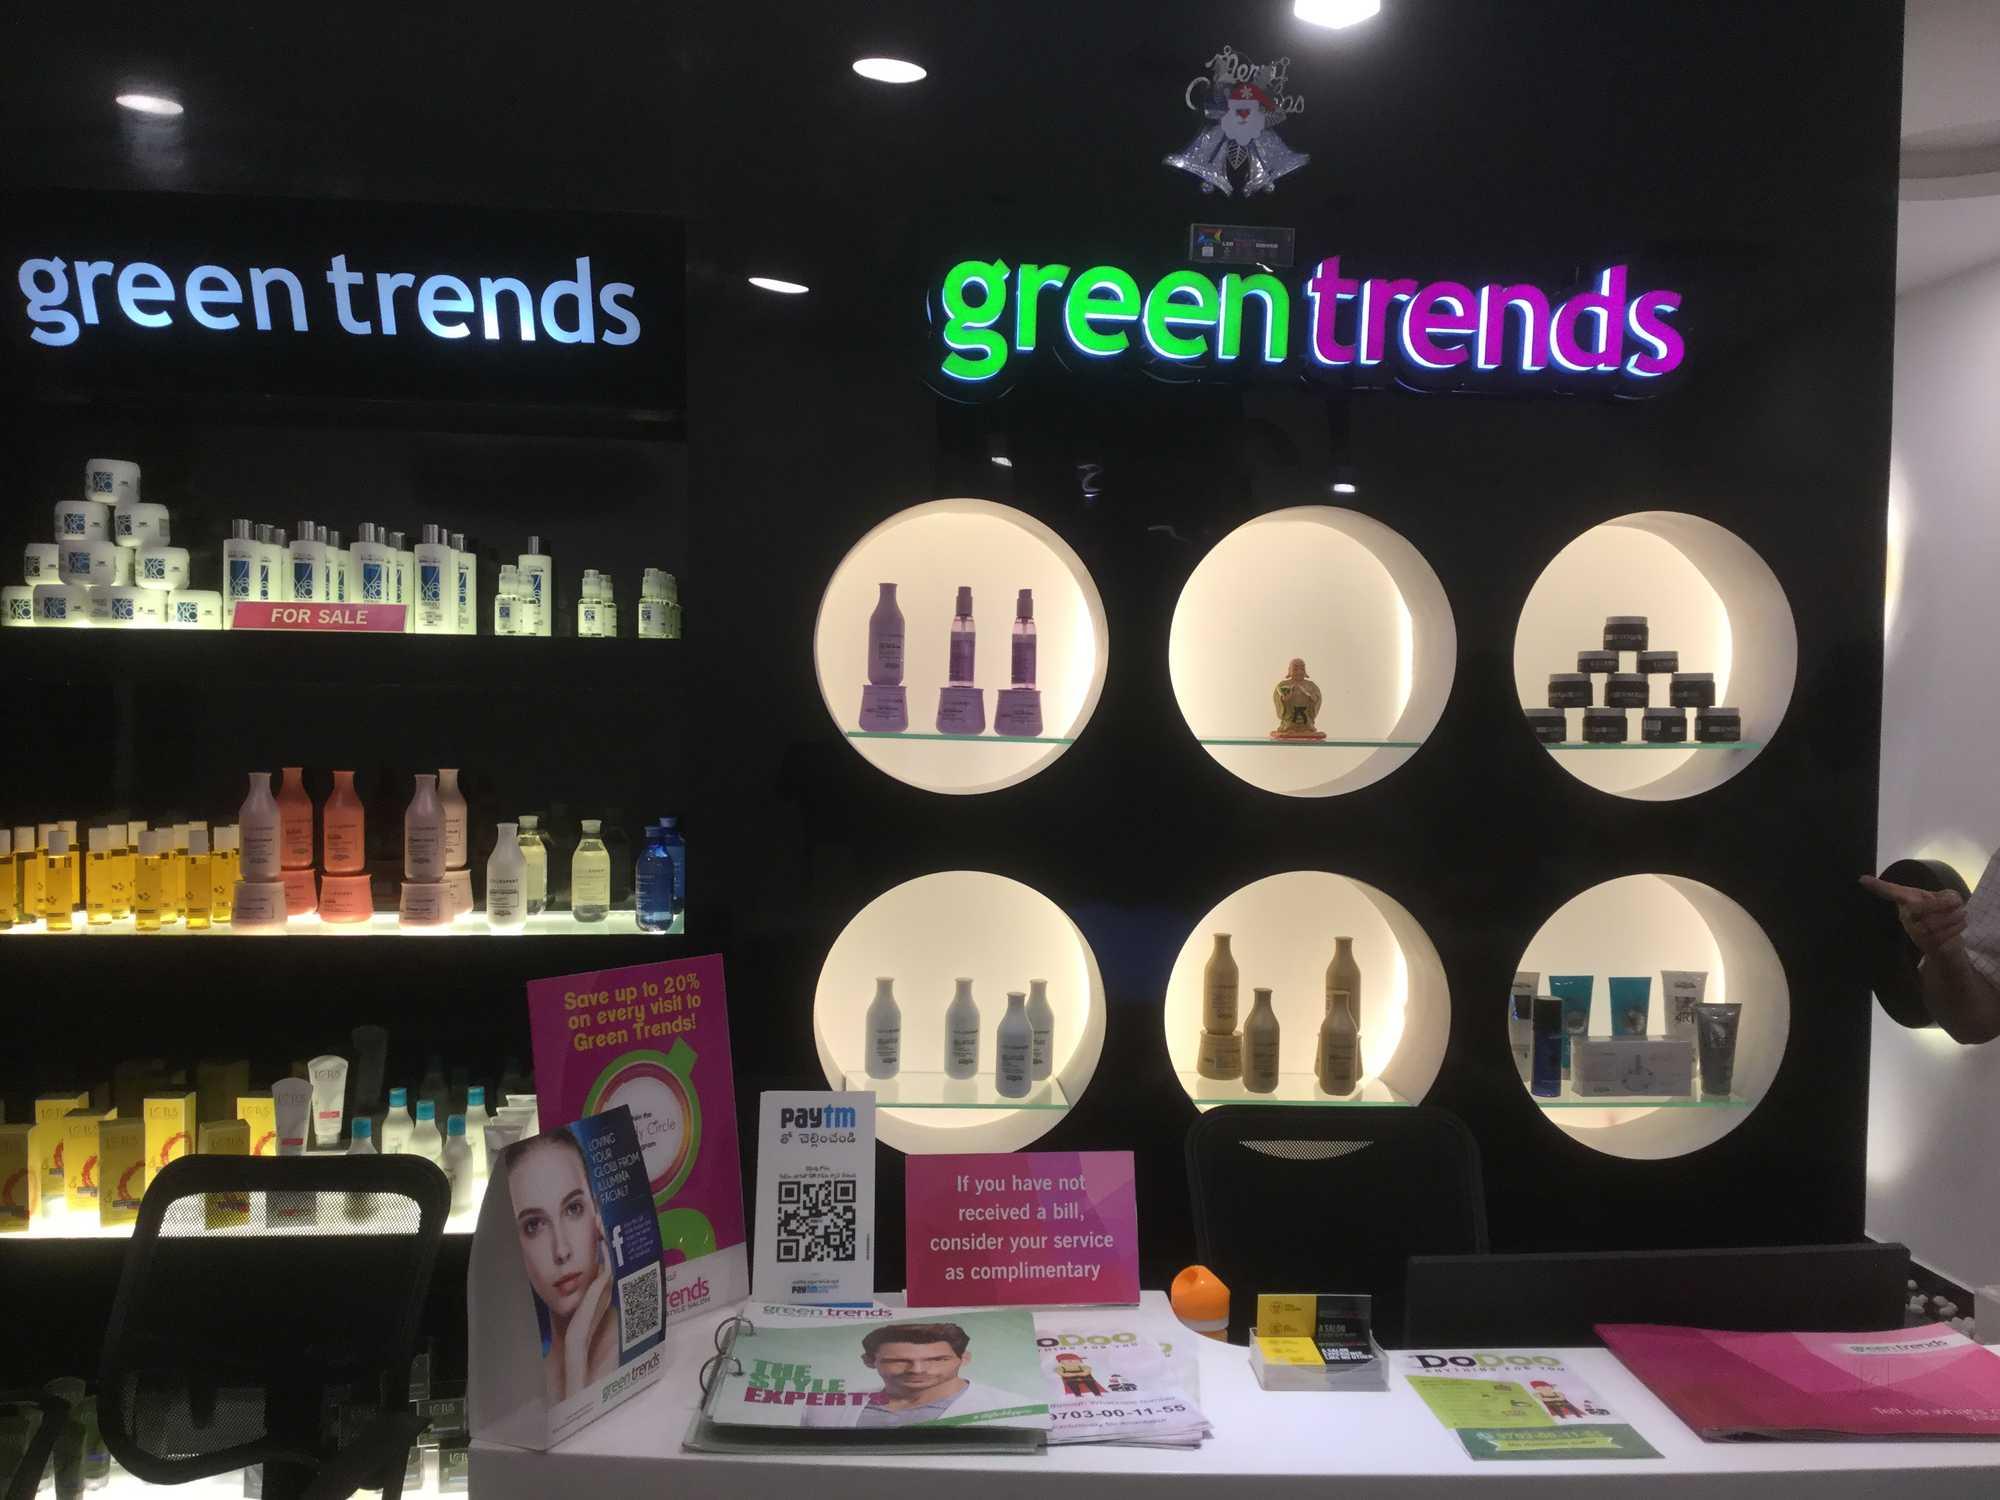 green trends uni hair style salon spa subash road ananthapur anantapur beauty spas 18noer0eow